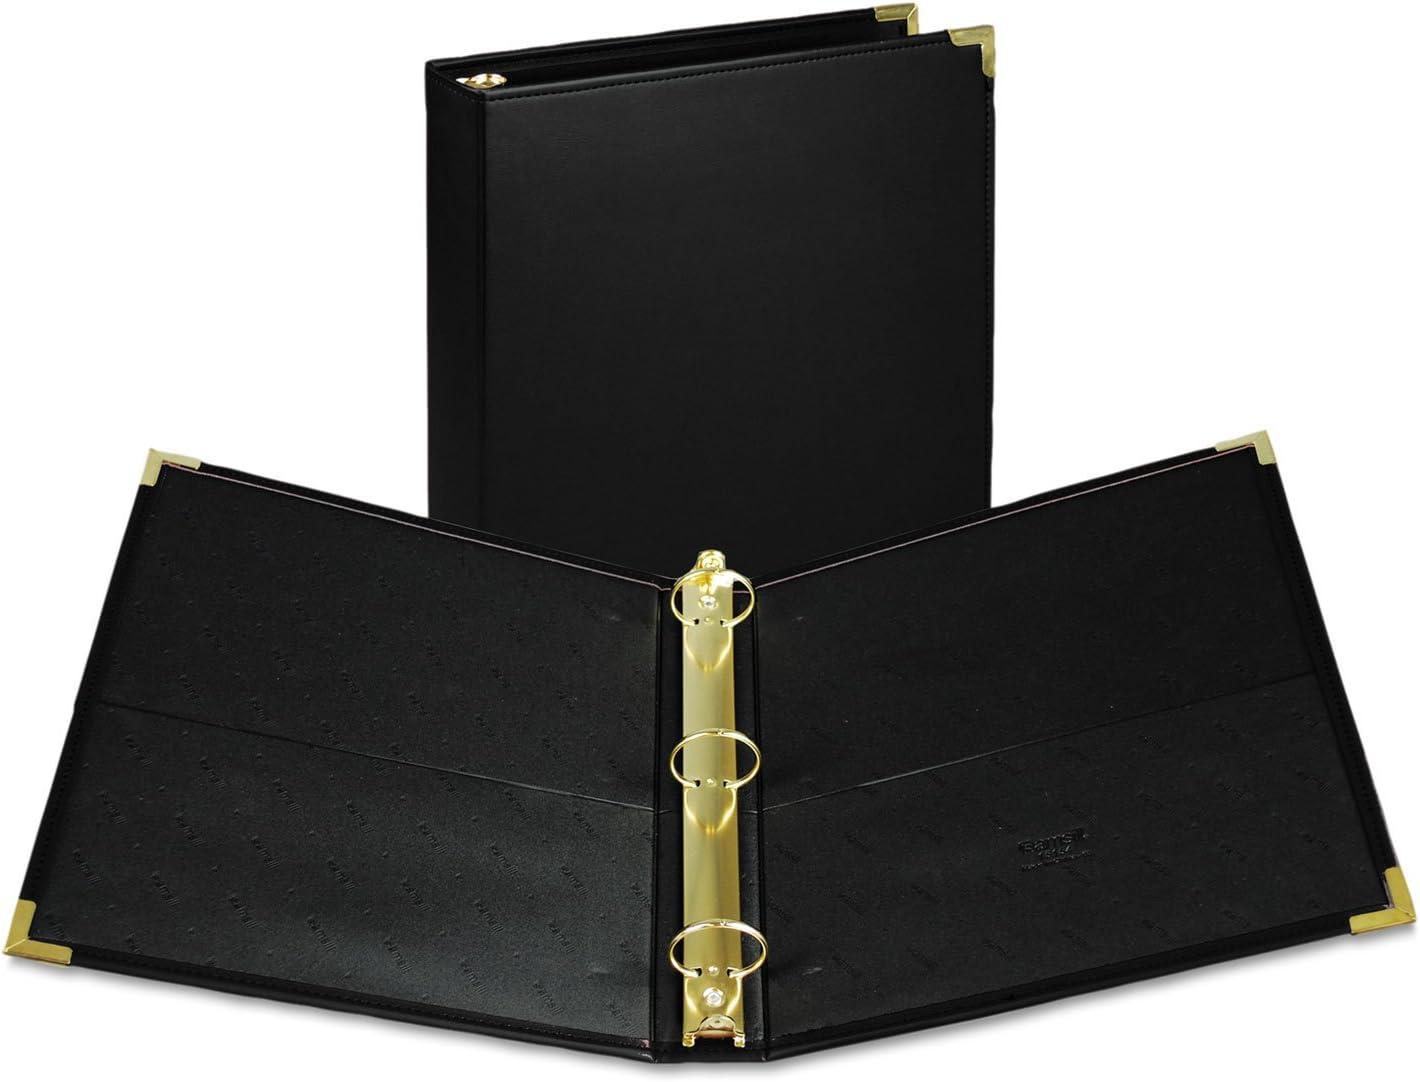 Samsill Leather-Like Classic Collectn Ring Binder SAM15150